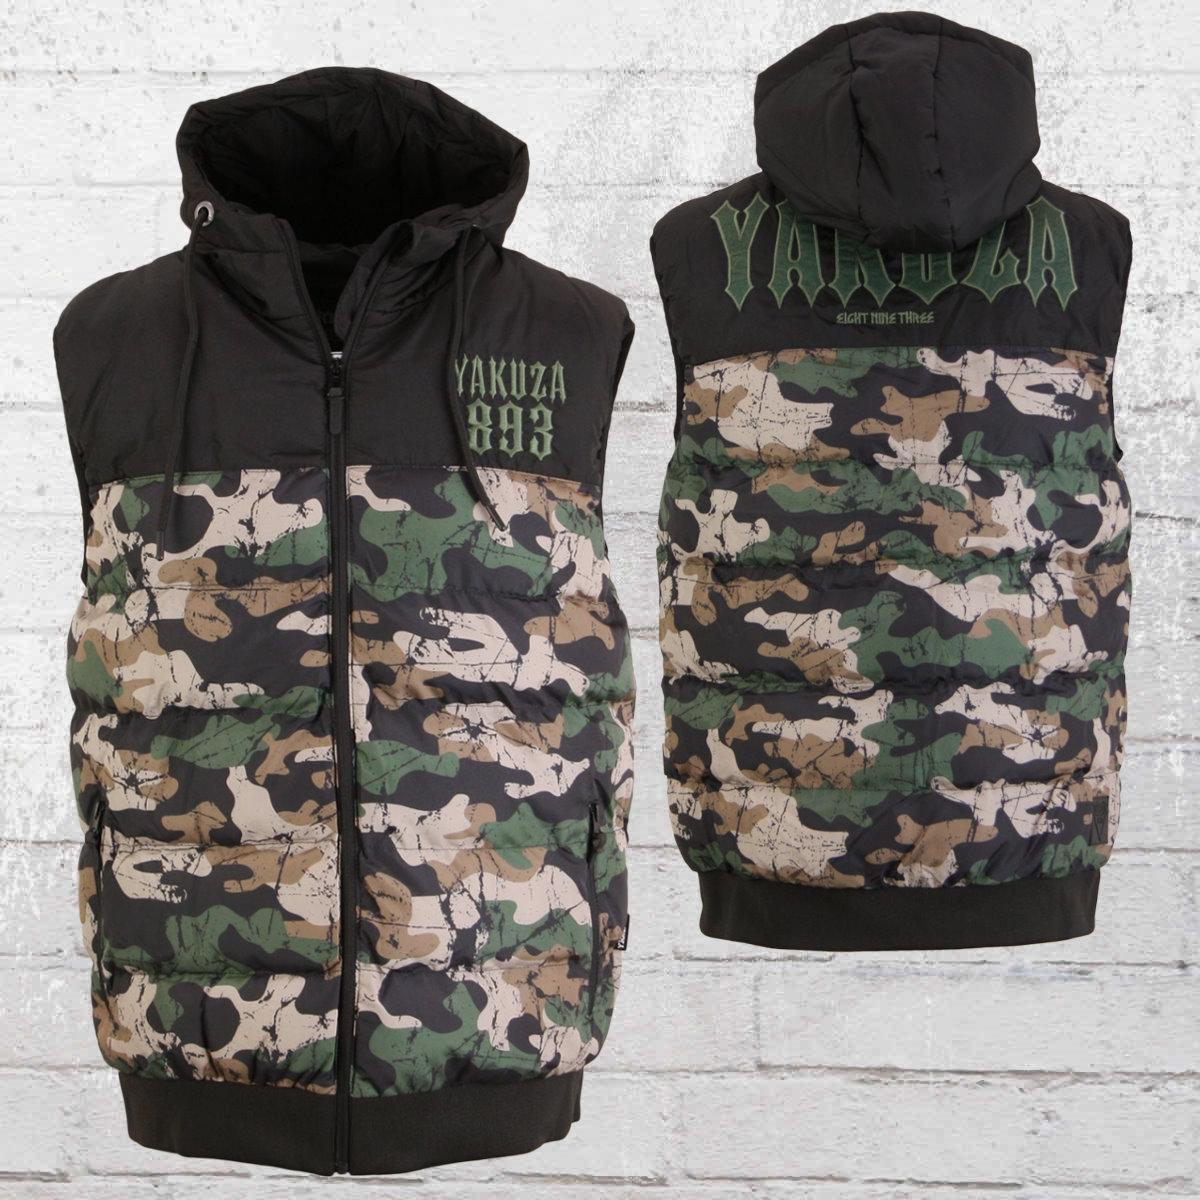 Yakuza Herren Weste Fuck Society schwarz camouflage